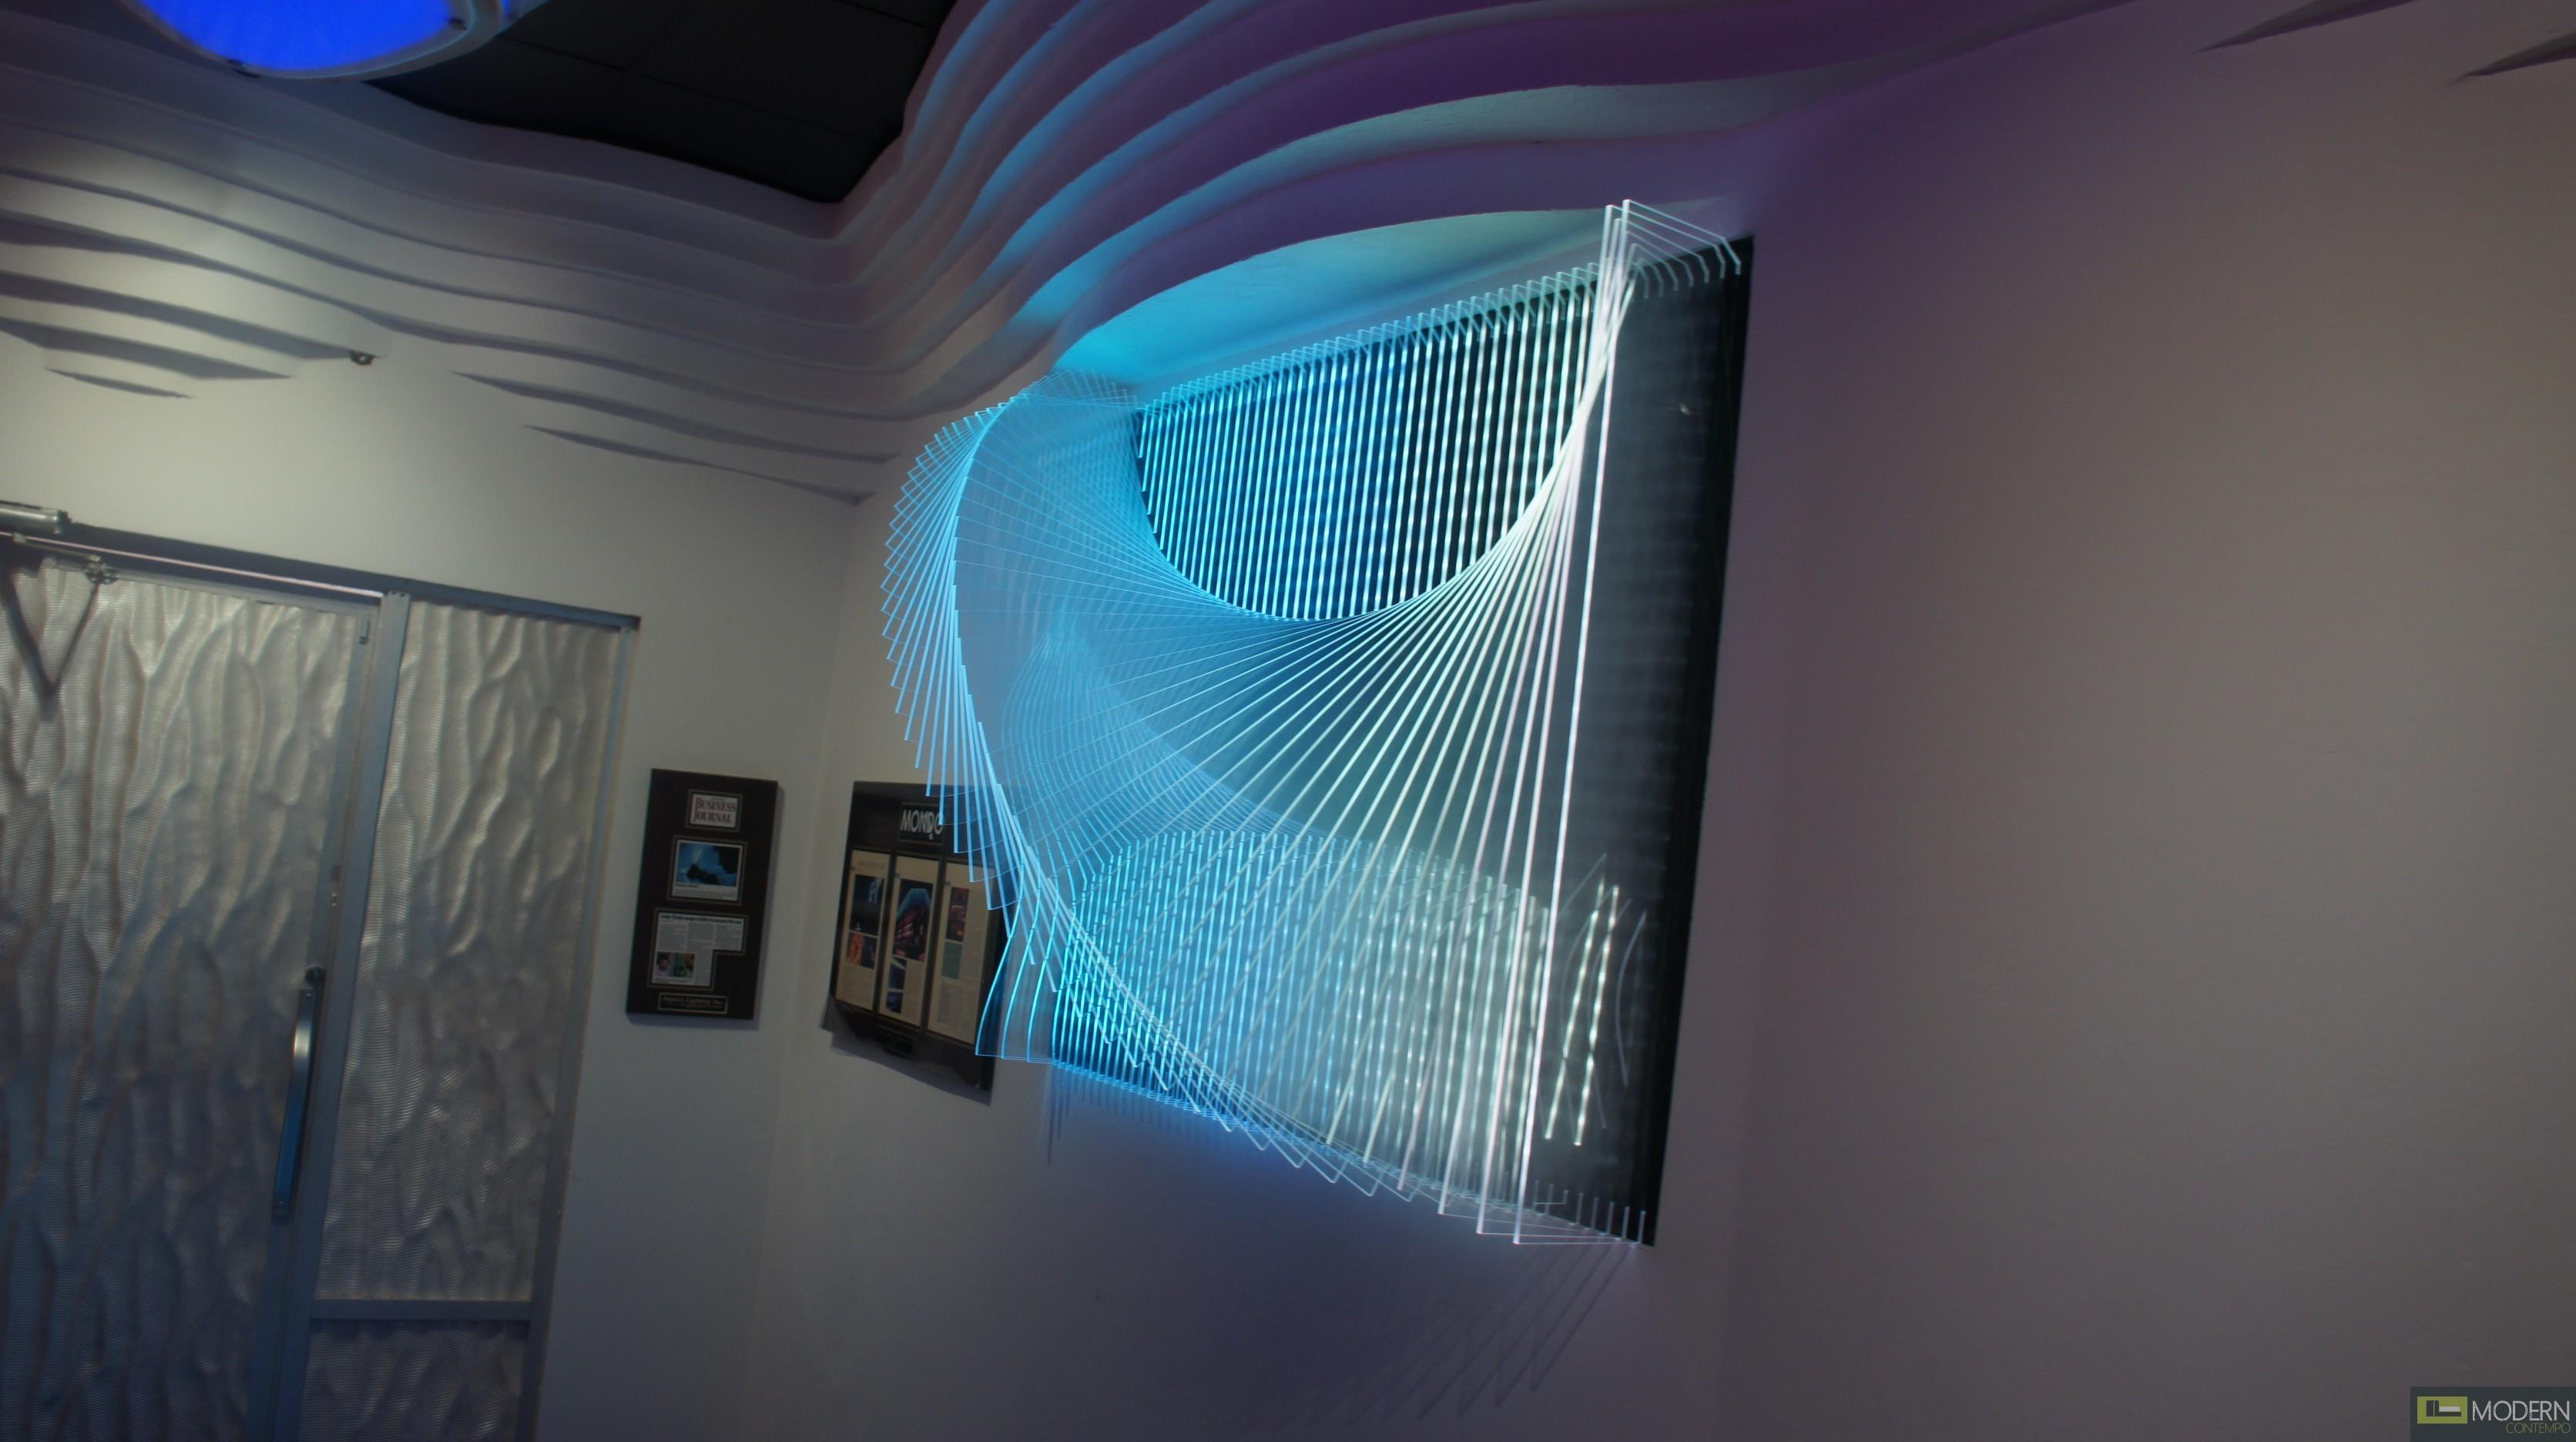 Modern Design Acrylic 3d Wall Panel Led 3dwalldecor Led